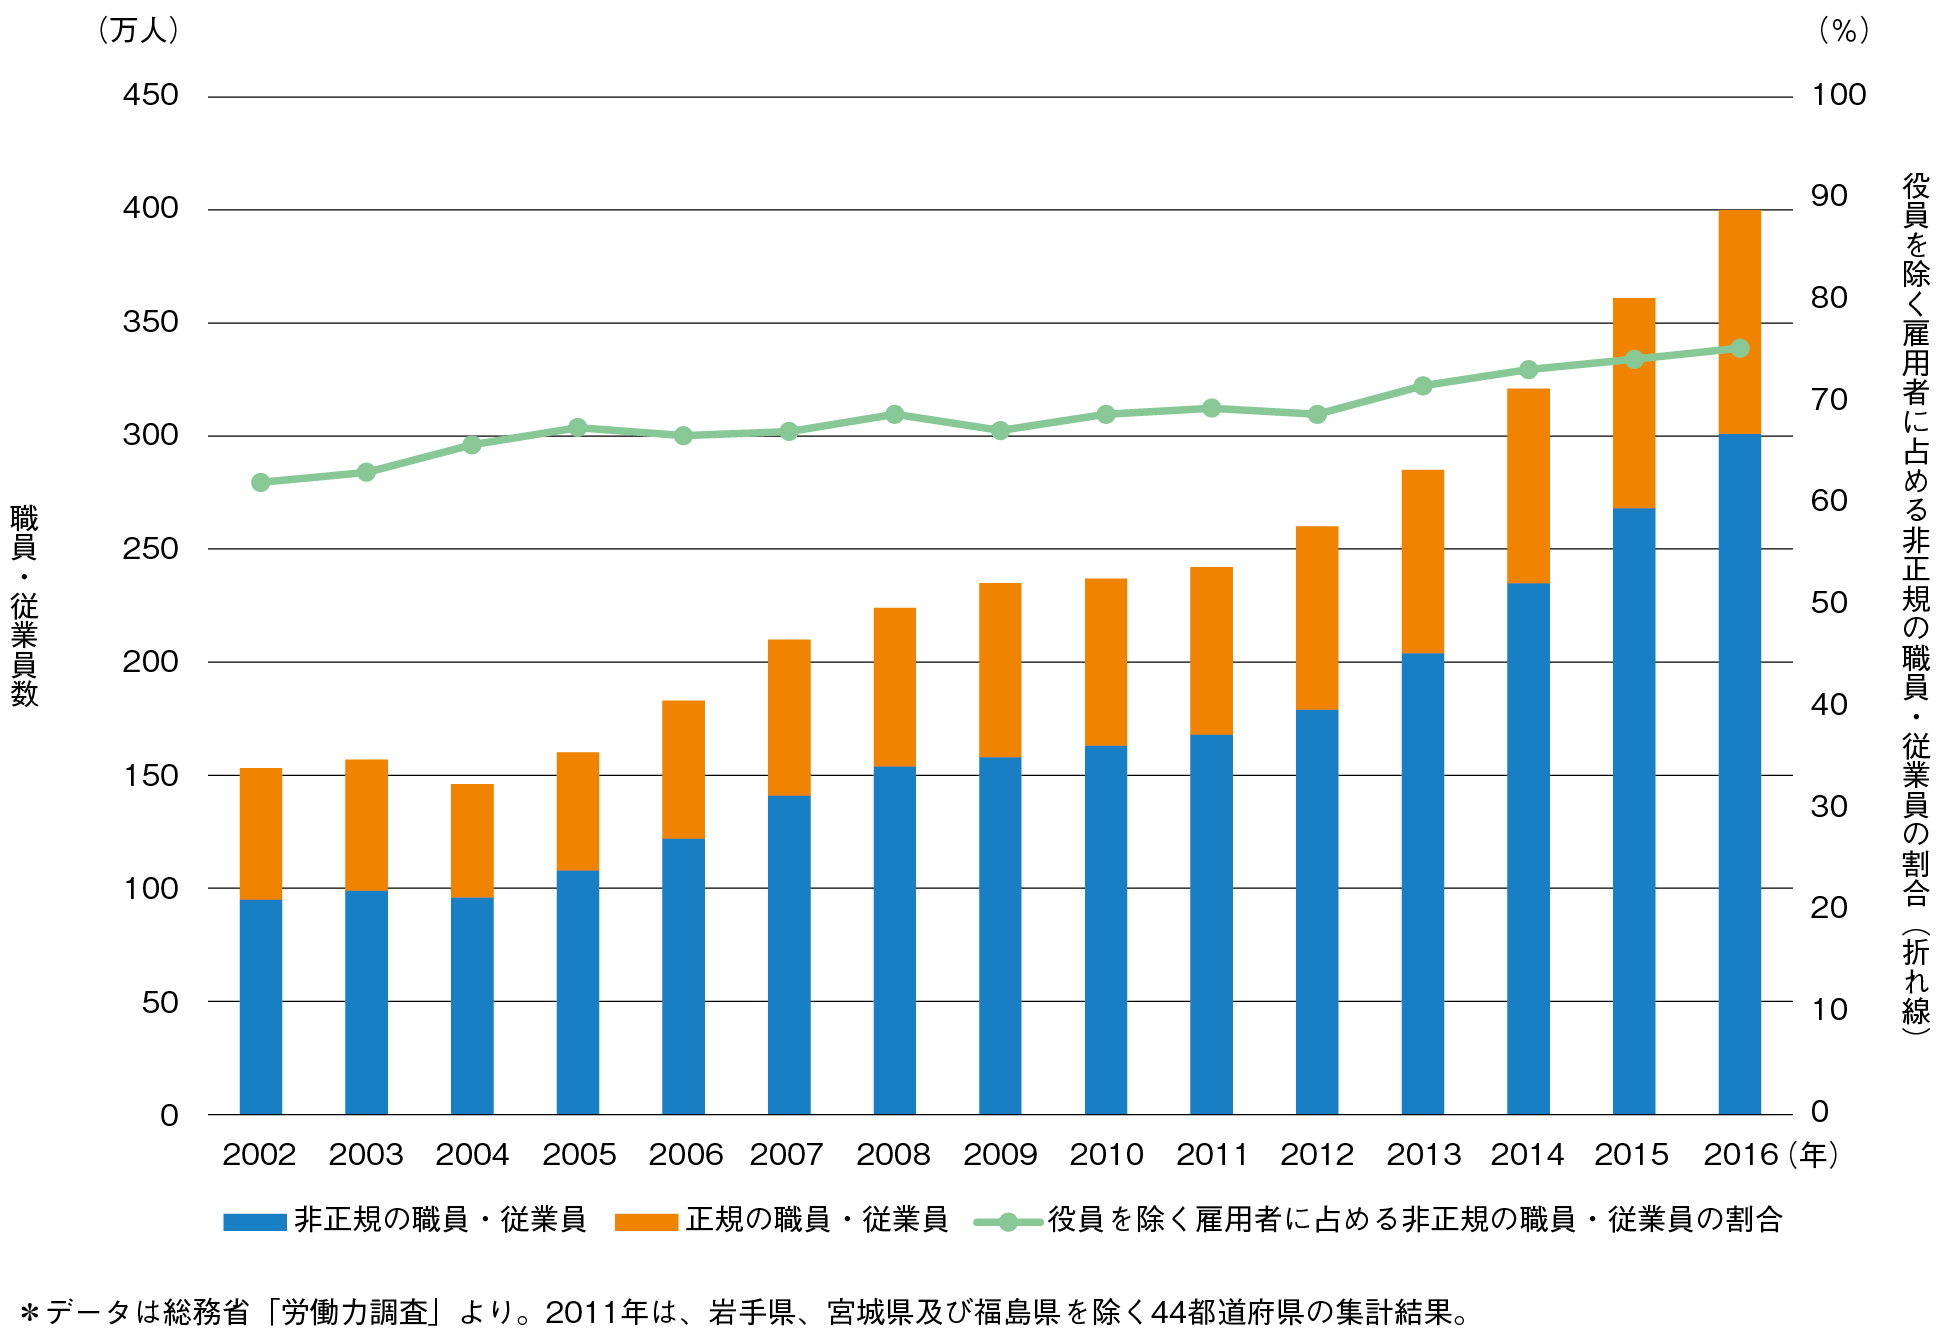 図1-2-8 65歳以上の正規・非正規職員数の推移 (出所:「平成29年版高齢社会白書」を基に筆者が作成)